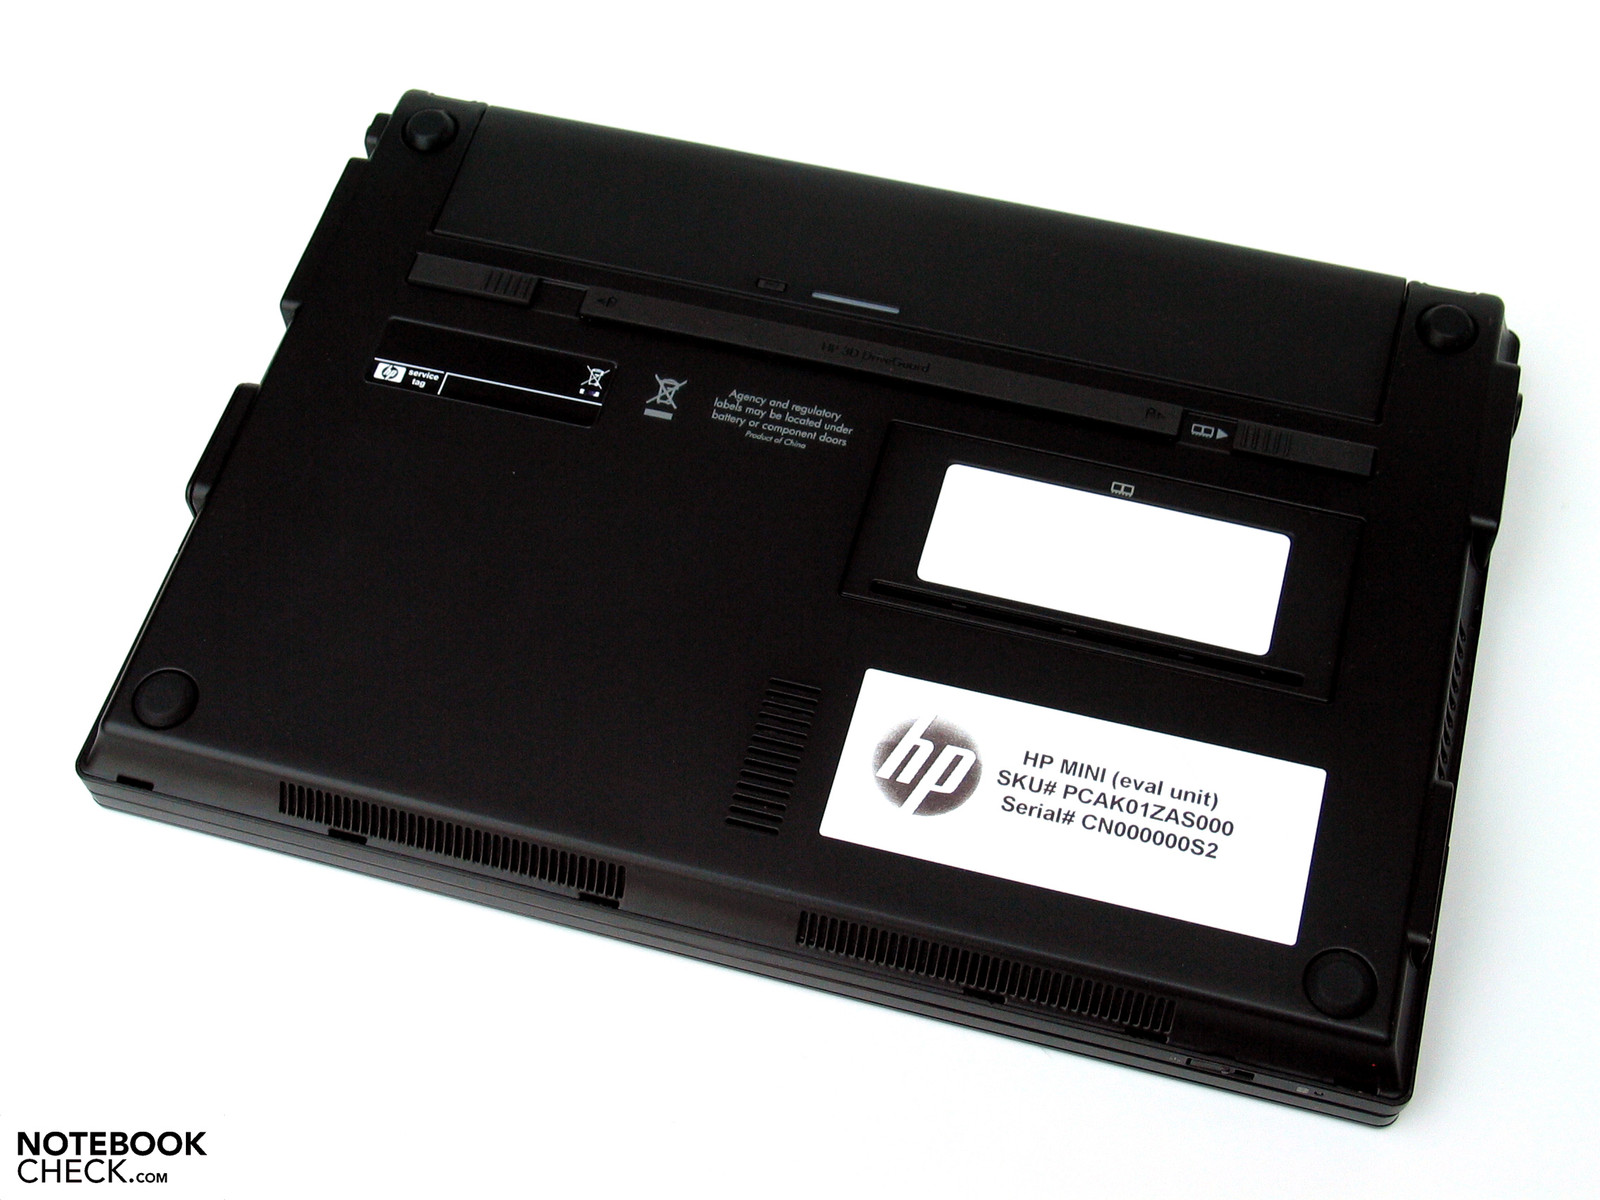 Testrapport hp mini 5101 netbook - Kleine lay outs het oppervlak ...